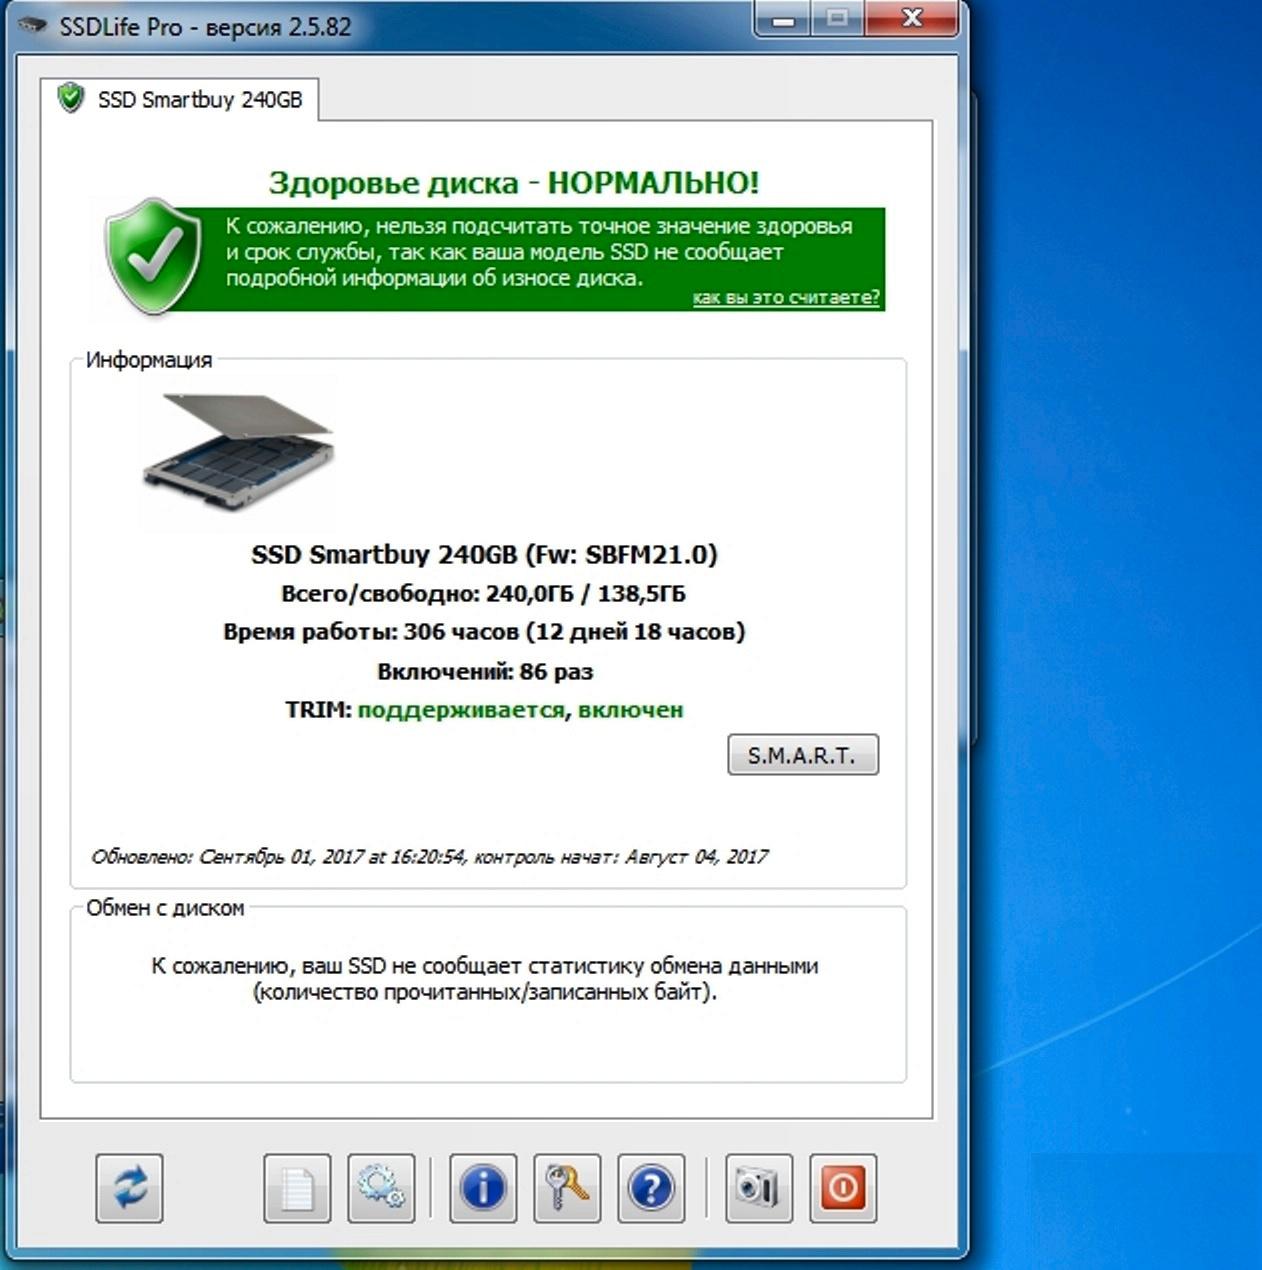 SSD Life Pro